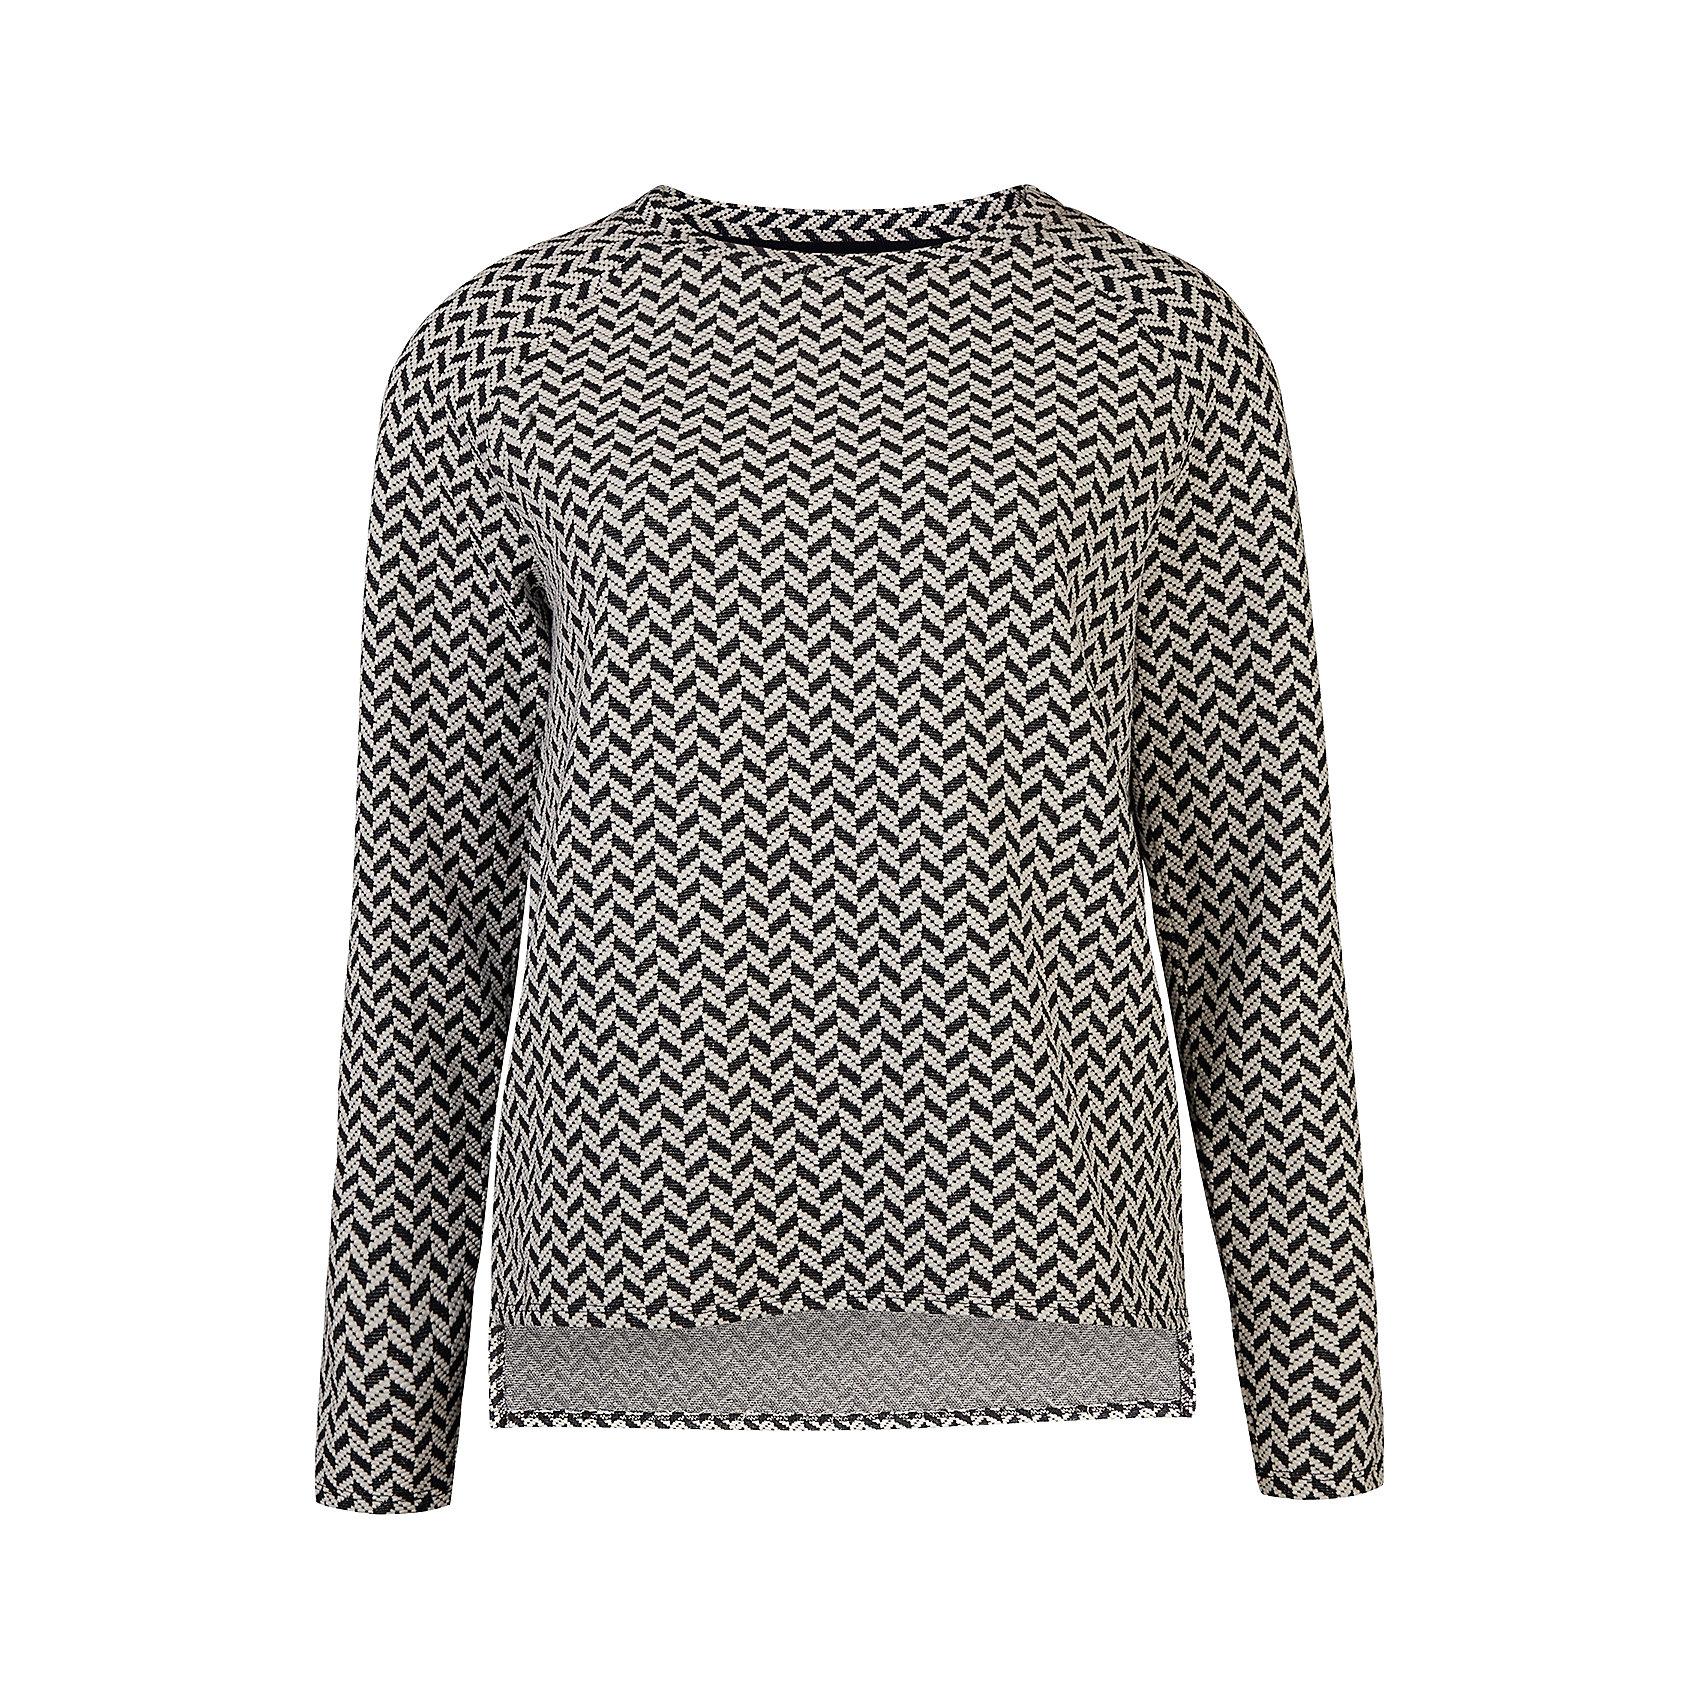 Neu-WE-Fashion-Pullover-blau-weiss-5649523